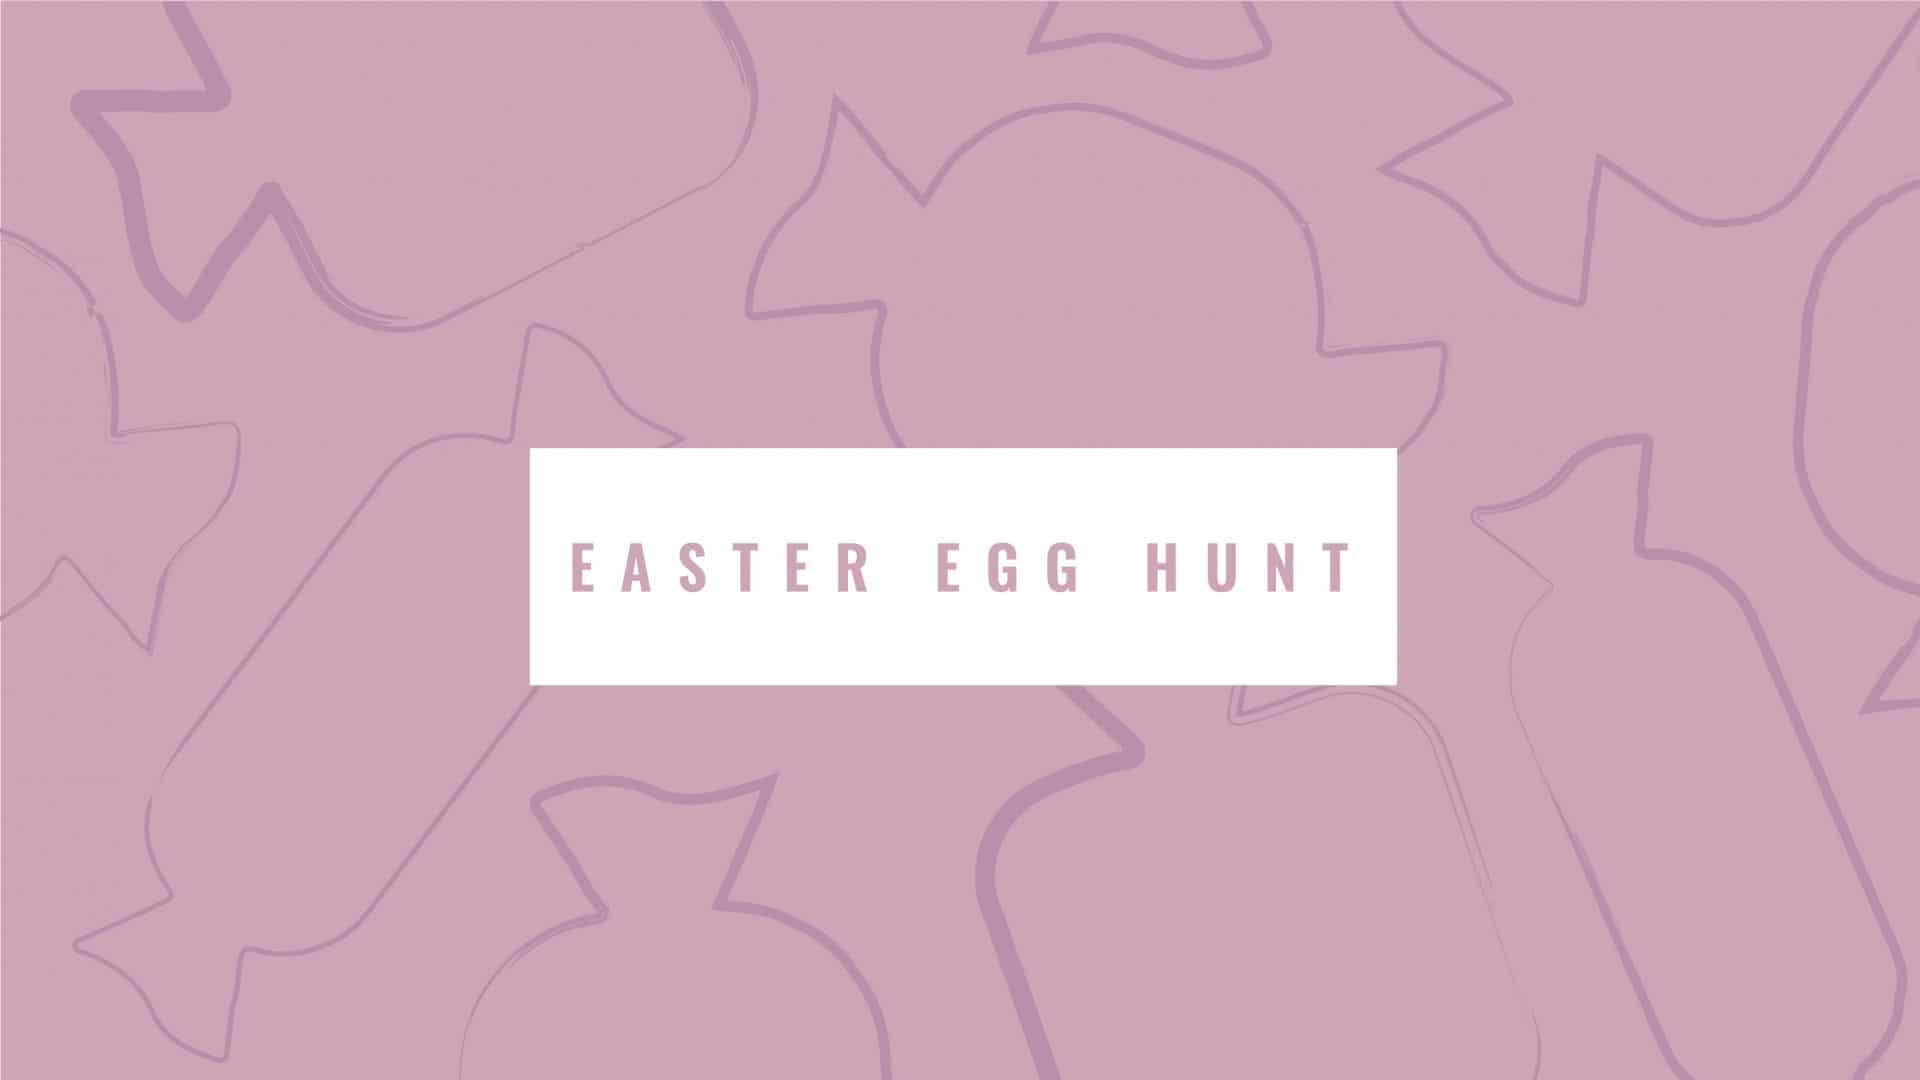 https://creeksidebiblechurch.org/events/egg-hunt/